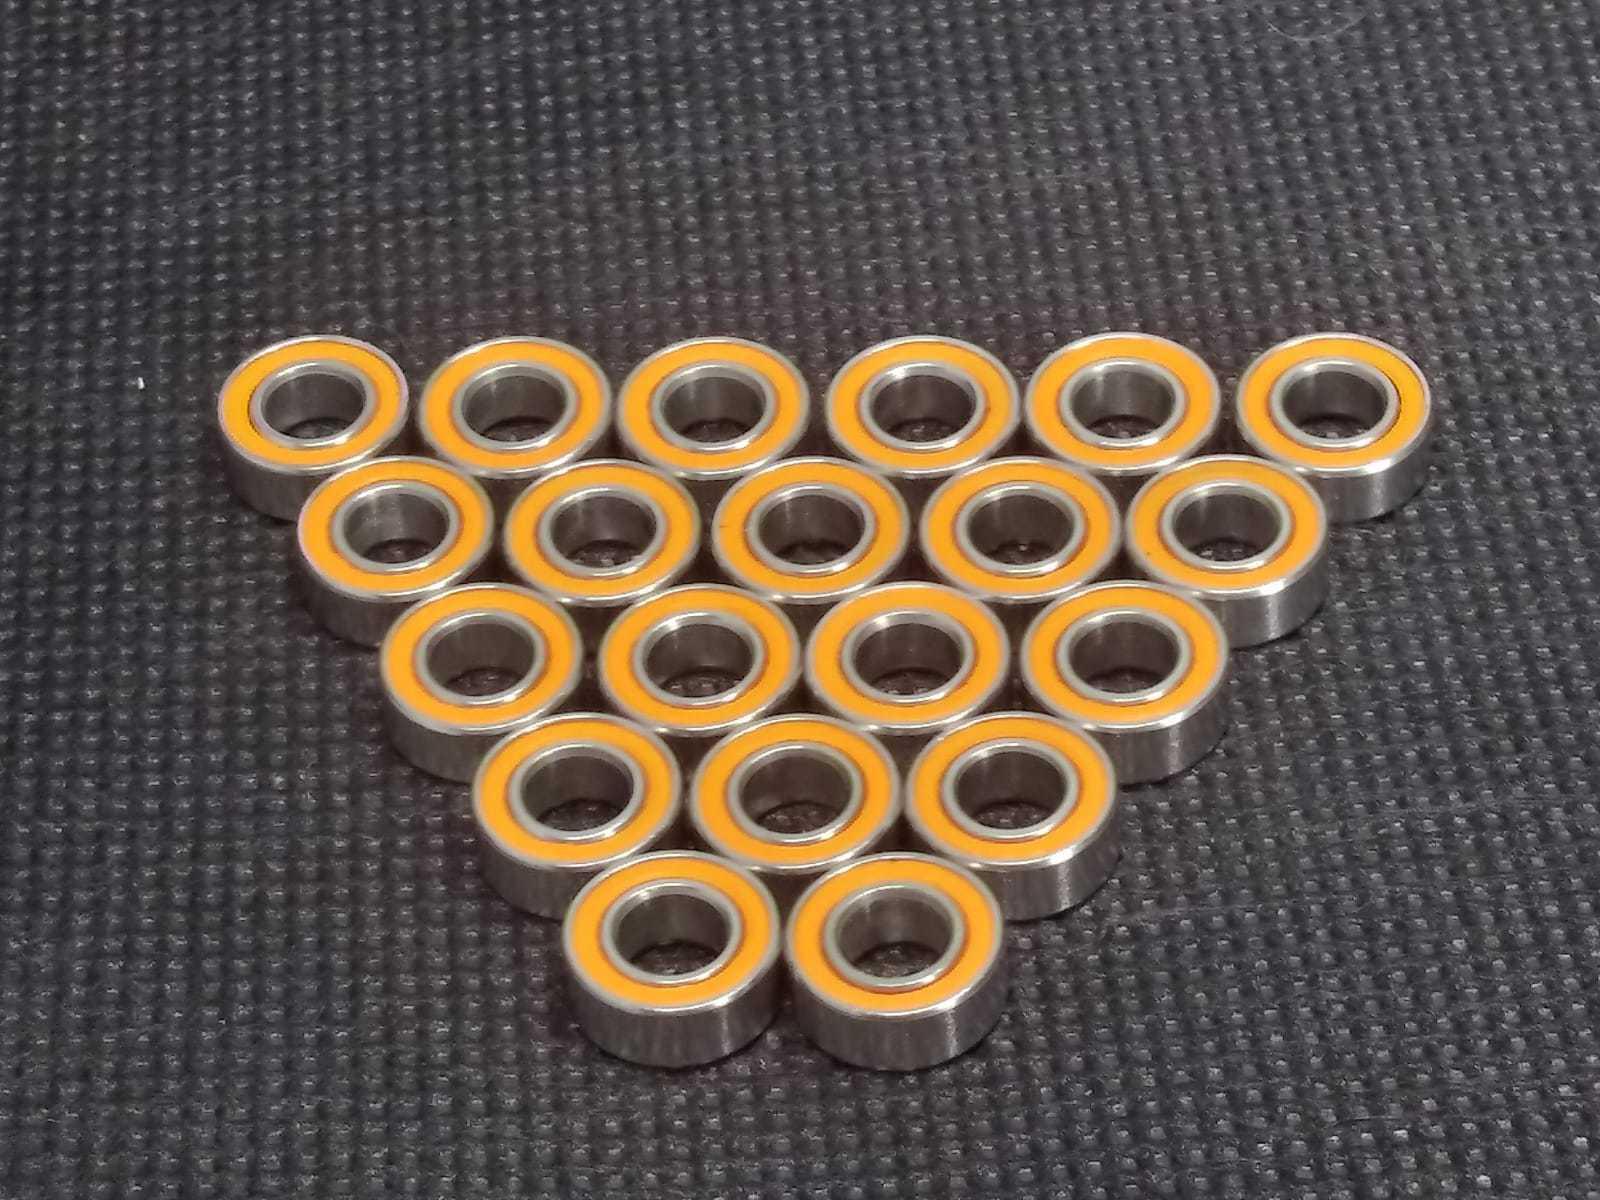 (QTY 20) 5x9x3 mm Hybrid Ceramic Ball Bearing  ABEC-7 orange ''FREE SHIPPING''  sale